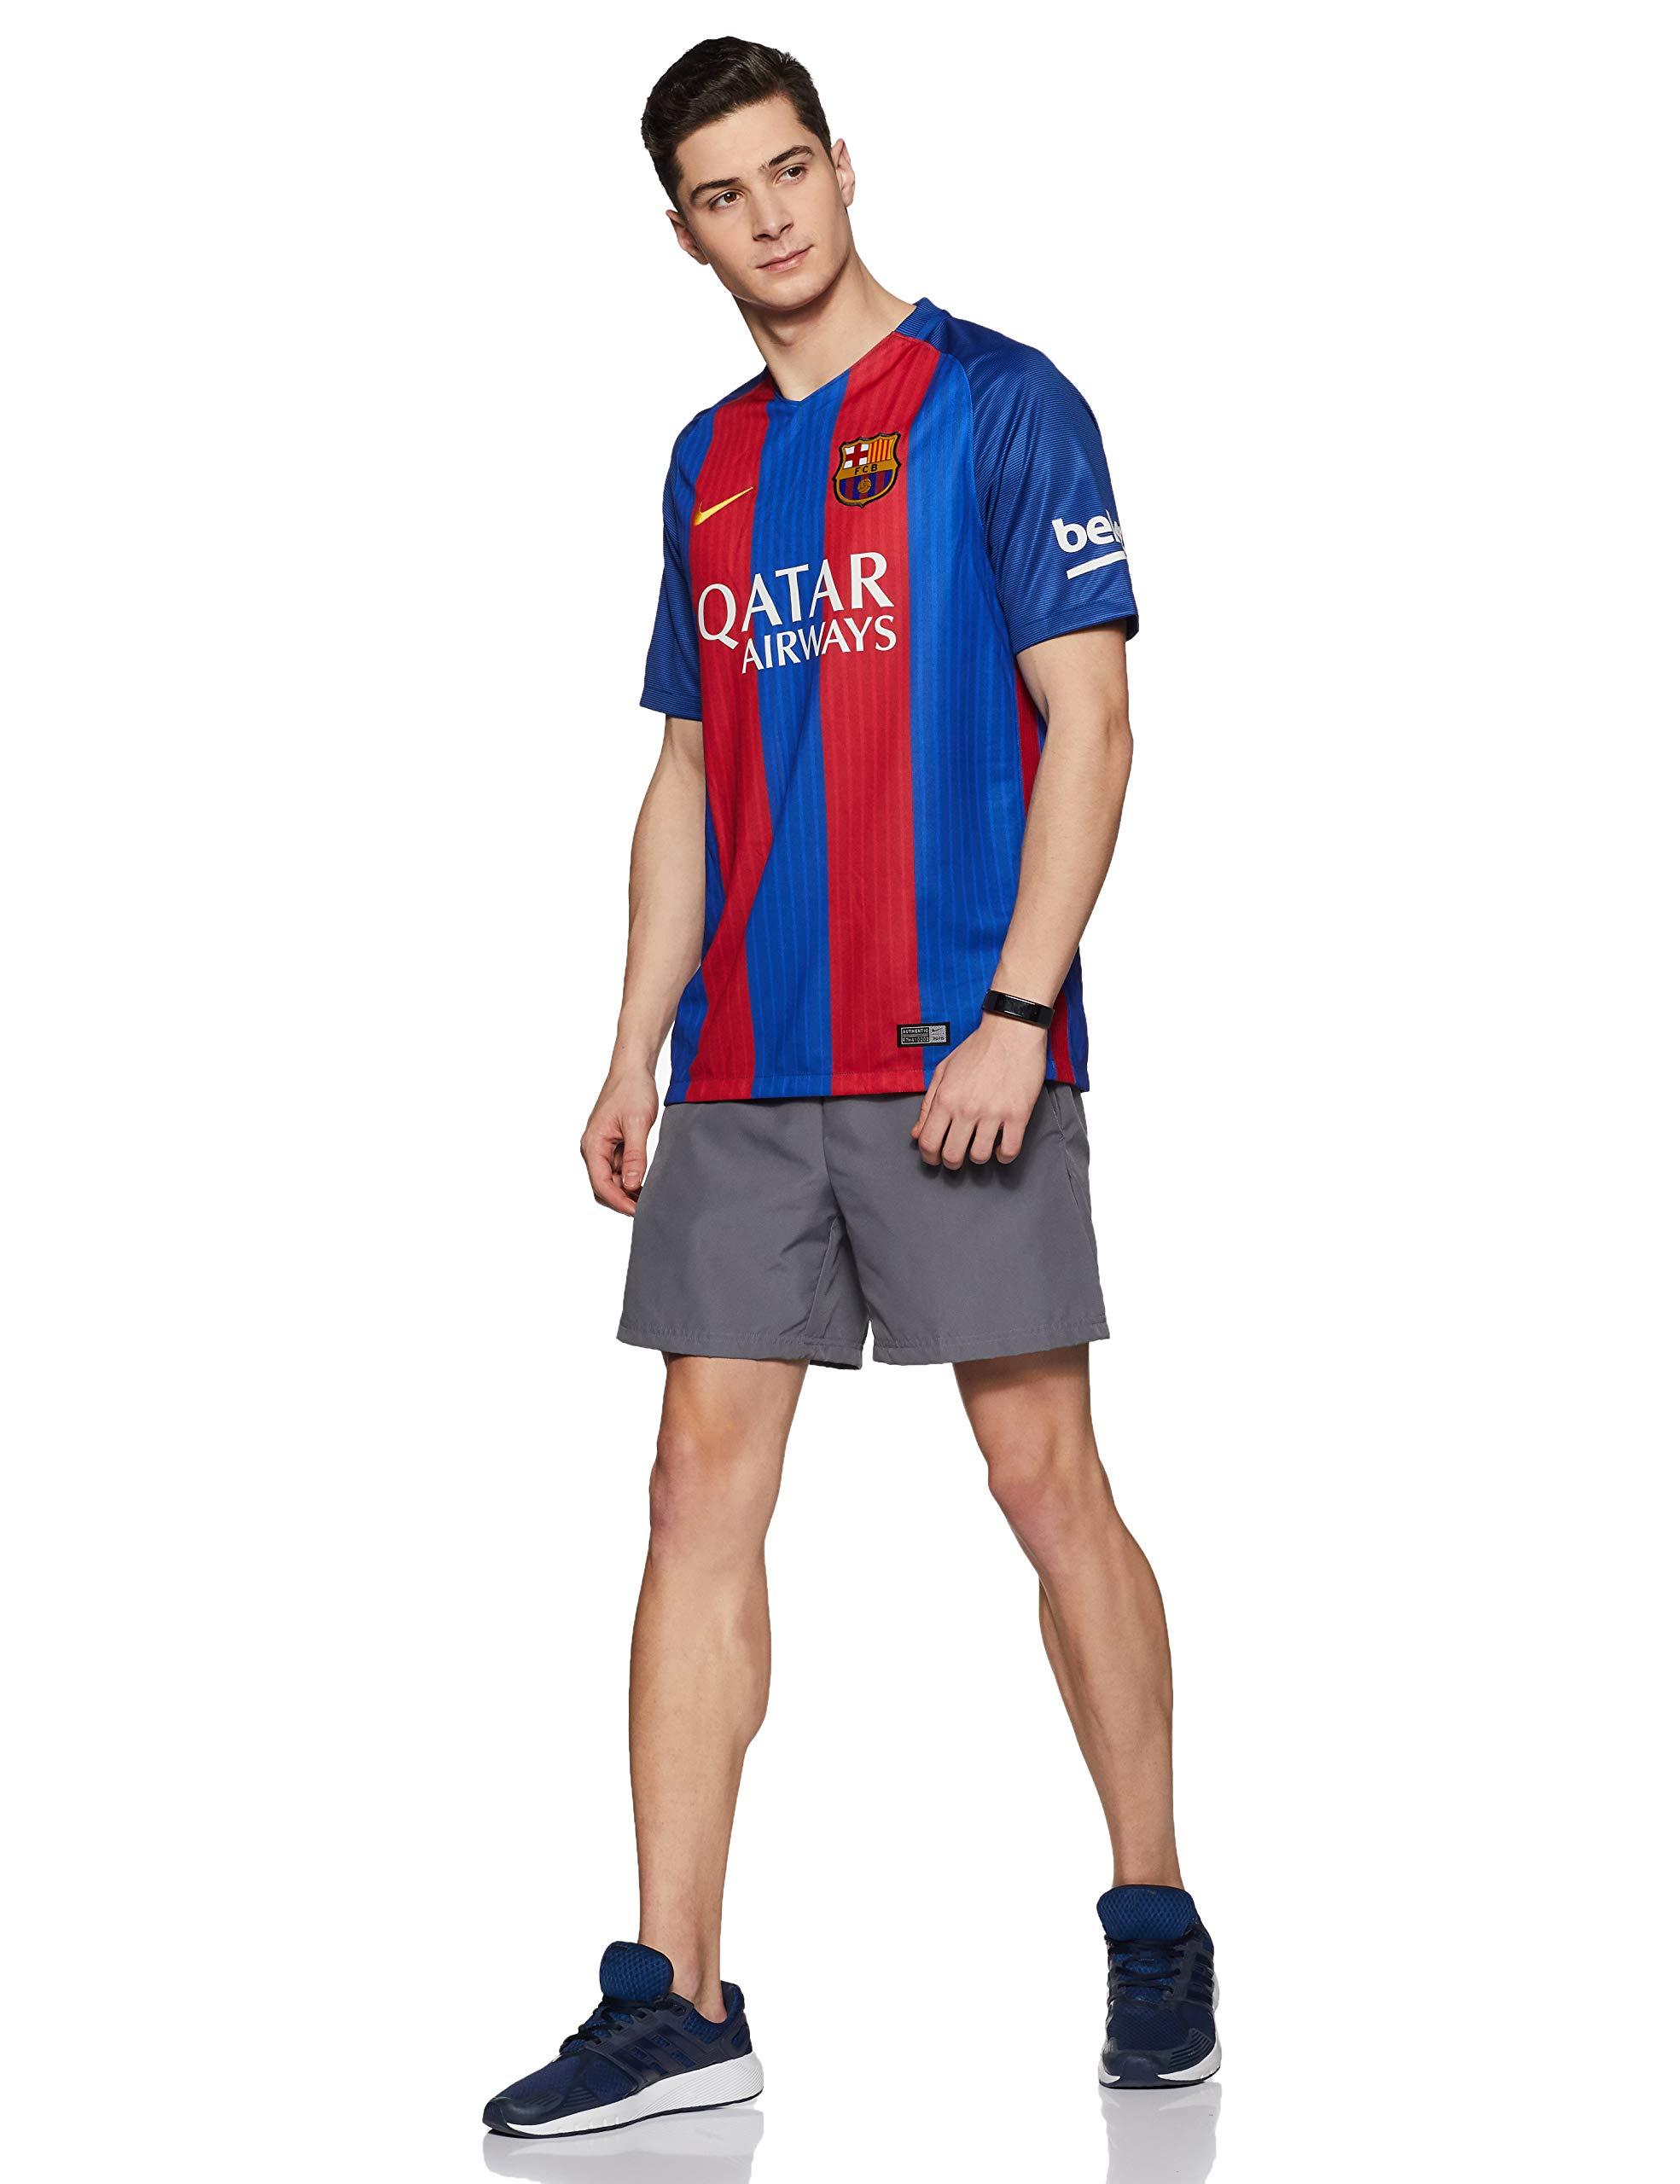 estoy enfermo motivo Literatura  Nike FC Barcelona M SS HM Stadium Jsy – Men's Short-Sleeved T-Shirt blue  Azul- Buy Online in Bahrain at bahrain.desertcart.com. ProductId : 54133639.